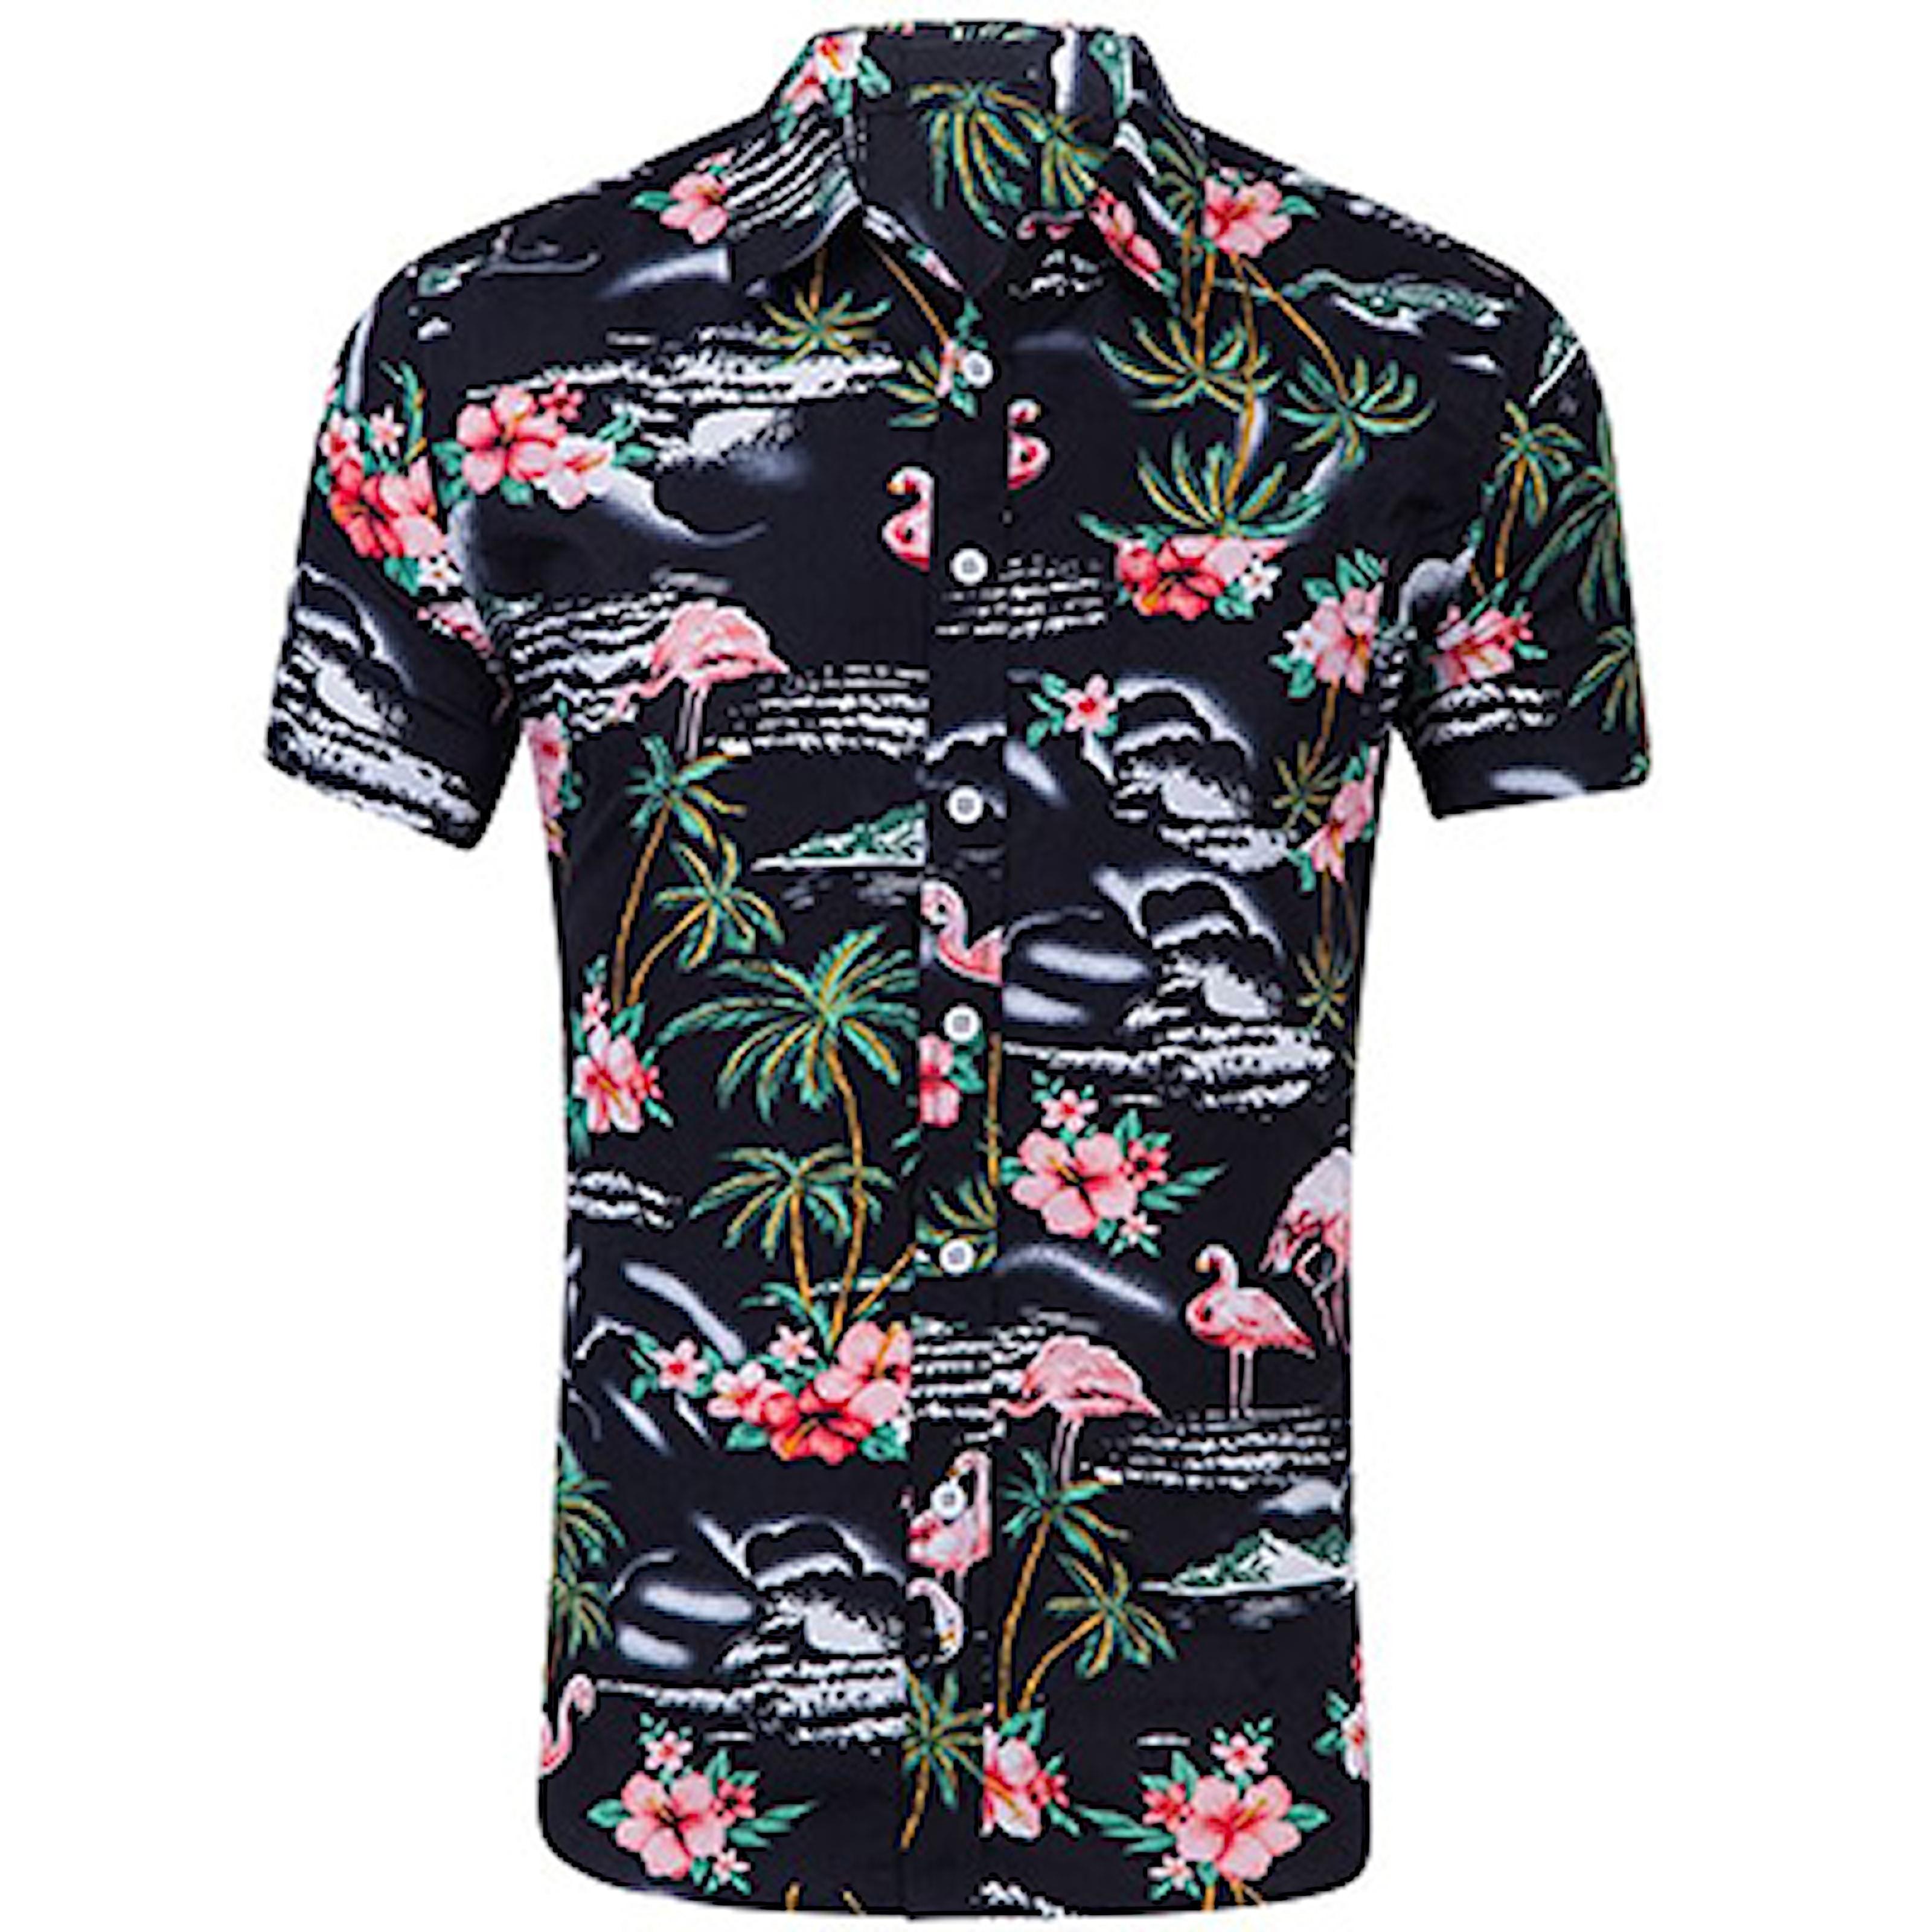 Svart, S, Hawaii Shirt For Men, Hawaii skjorte, ,